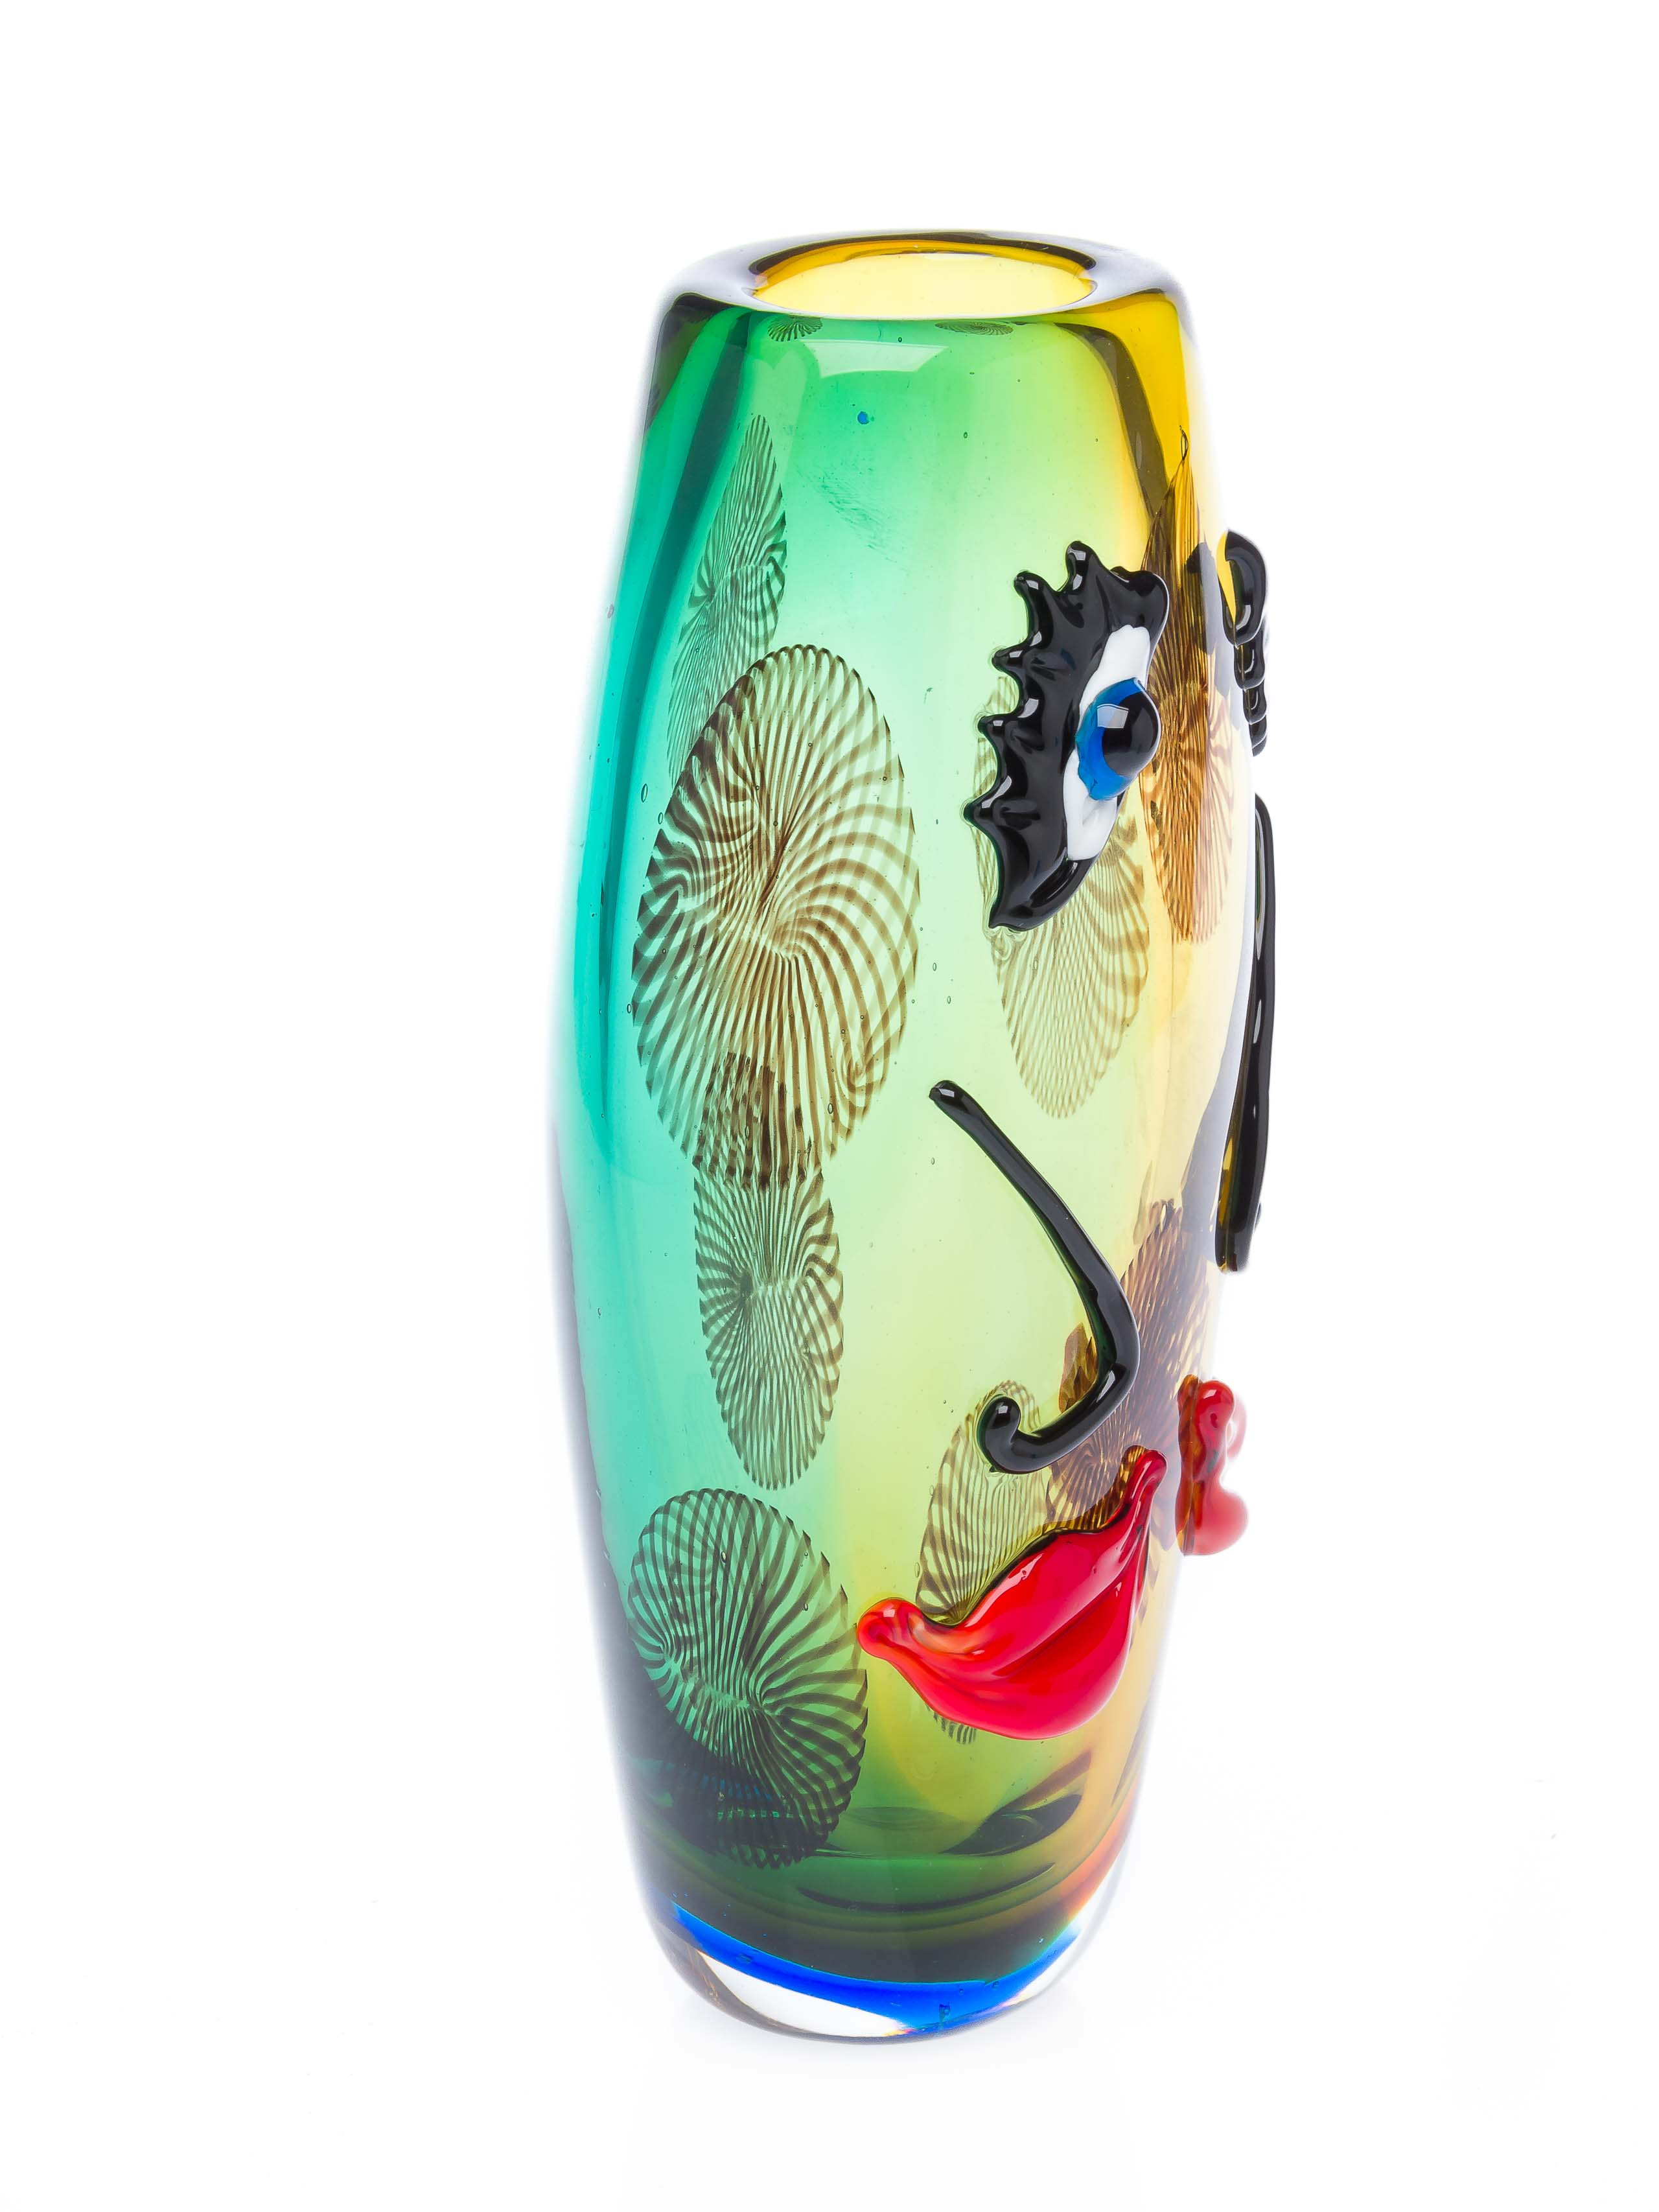 Glasvase Tischvase Gesicht moderne Kunst im Murano Stil Vase Blumenvase Glas